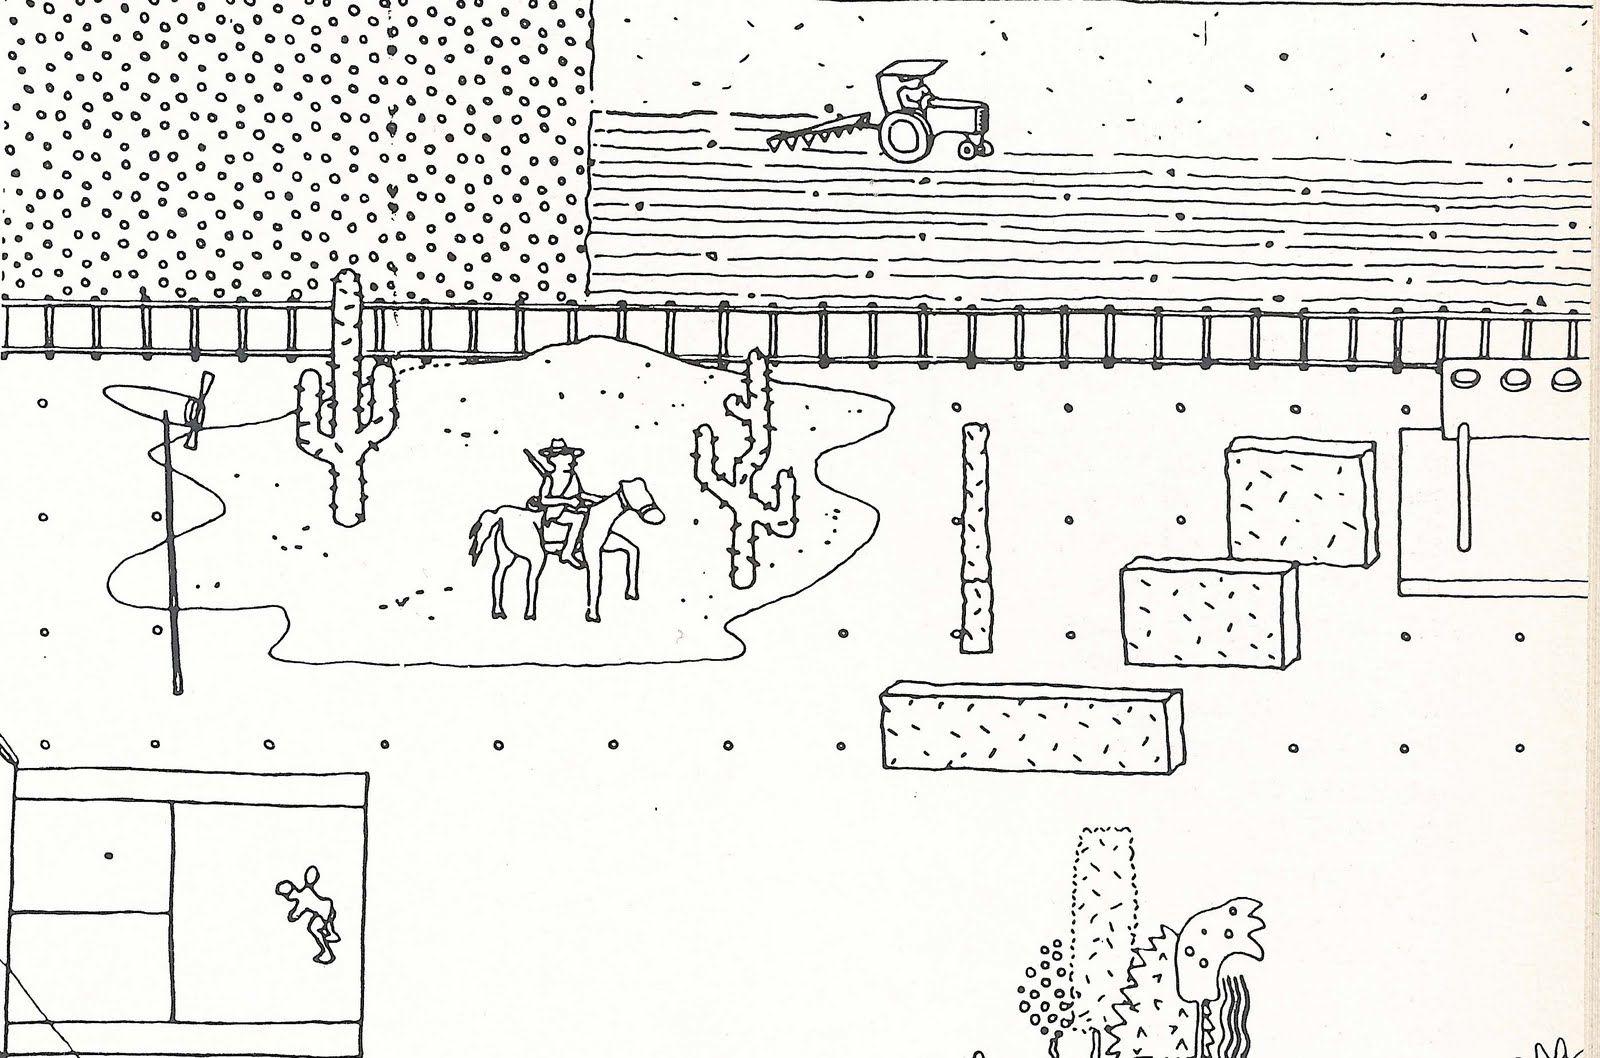 oma parc de la villette diagram labled of the eye rem koolhaas early sketches p r e s n t a i o